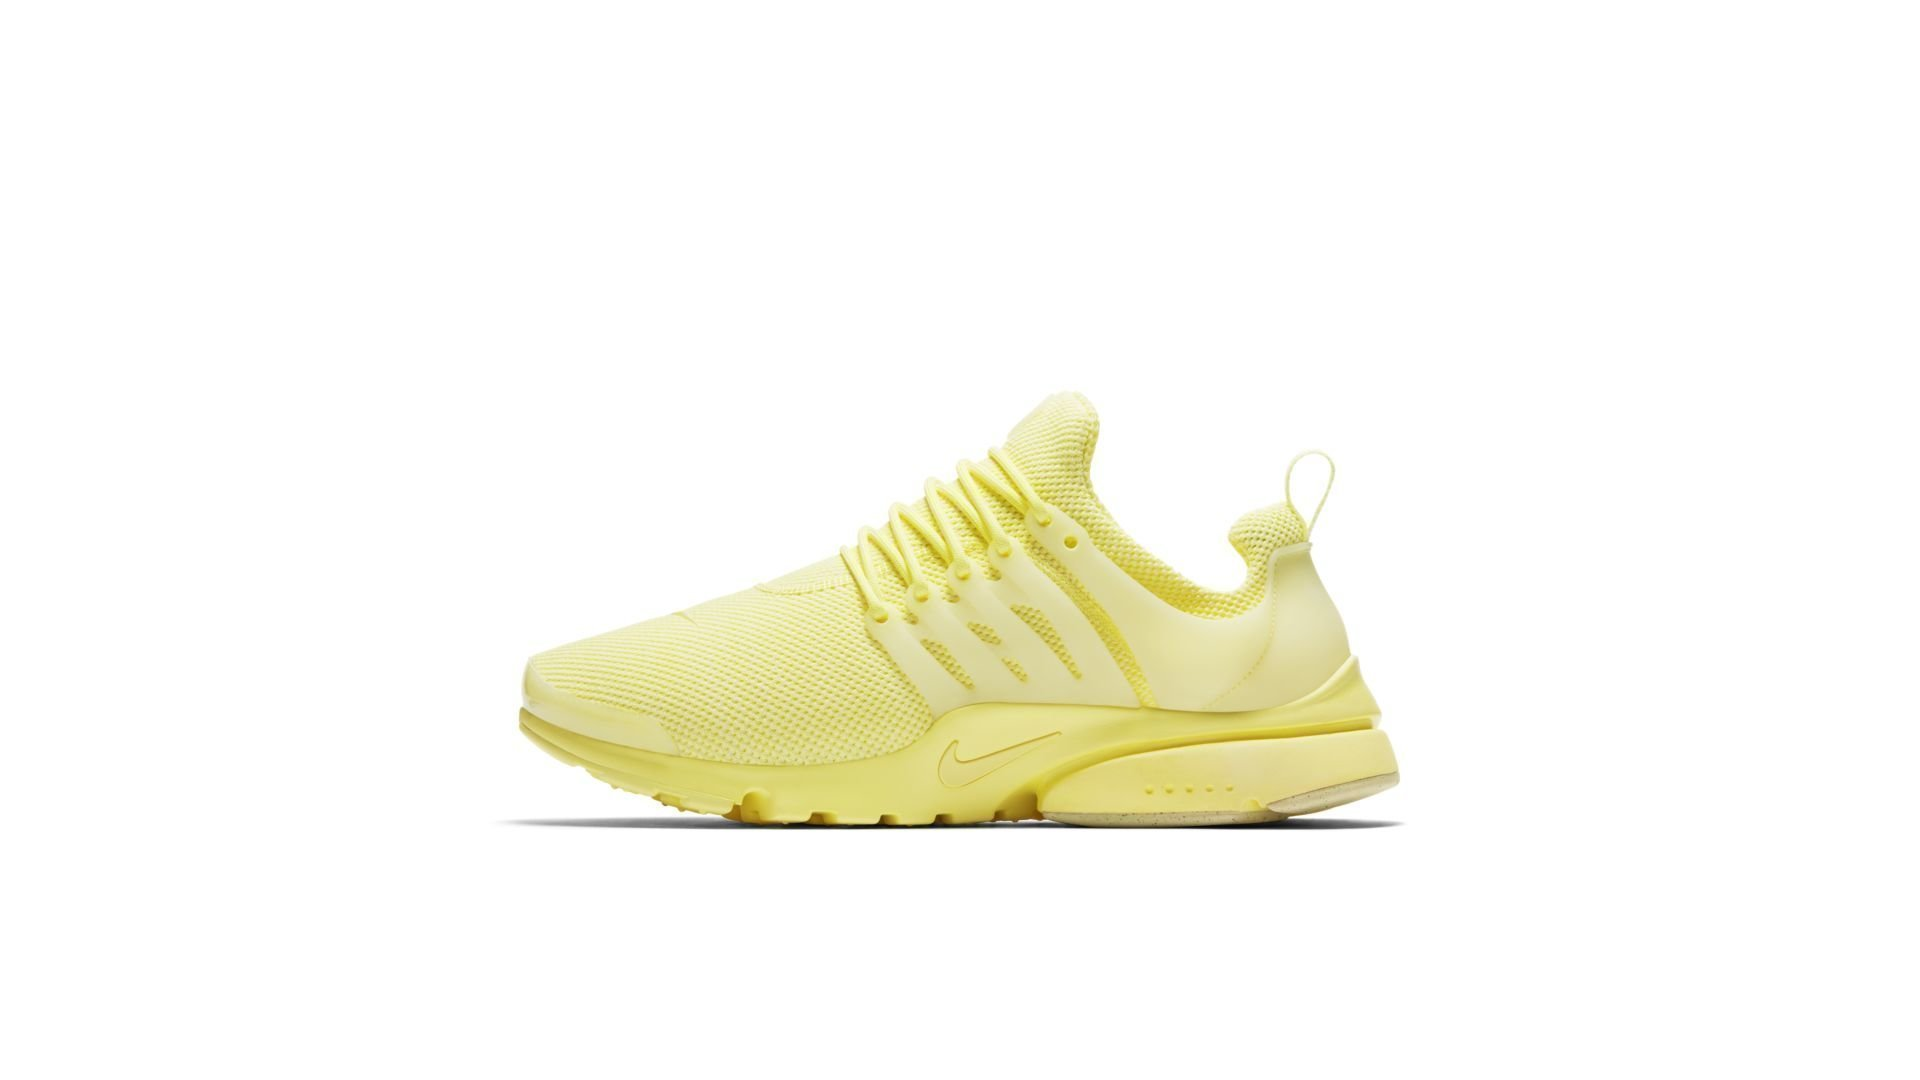 Nike Air Presto Ultra Breathe Lemon (898020-700)